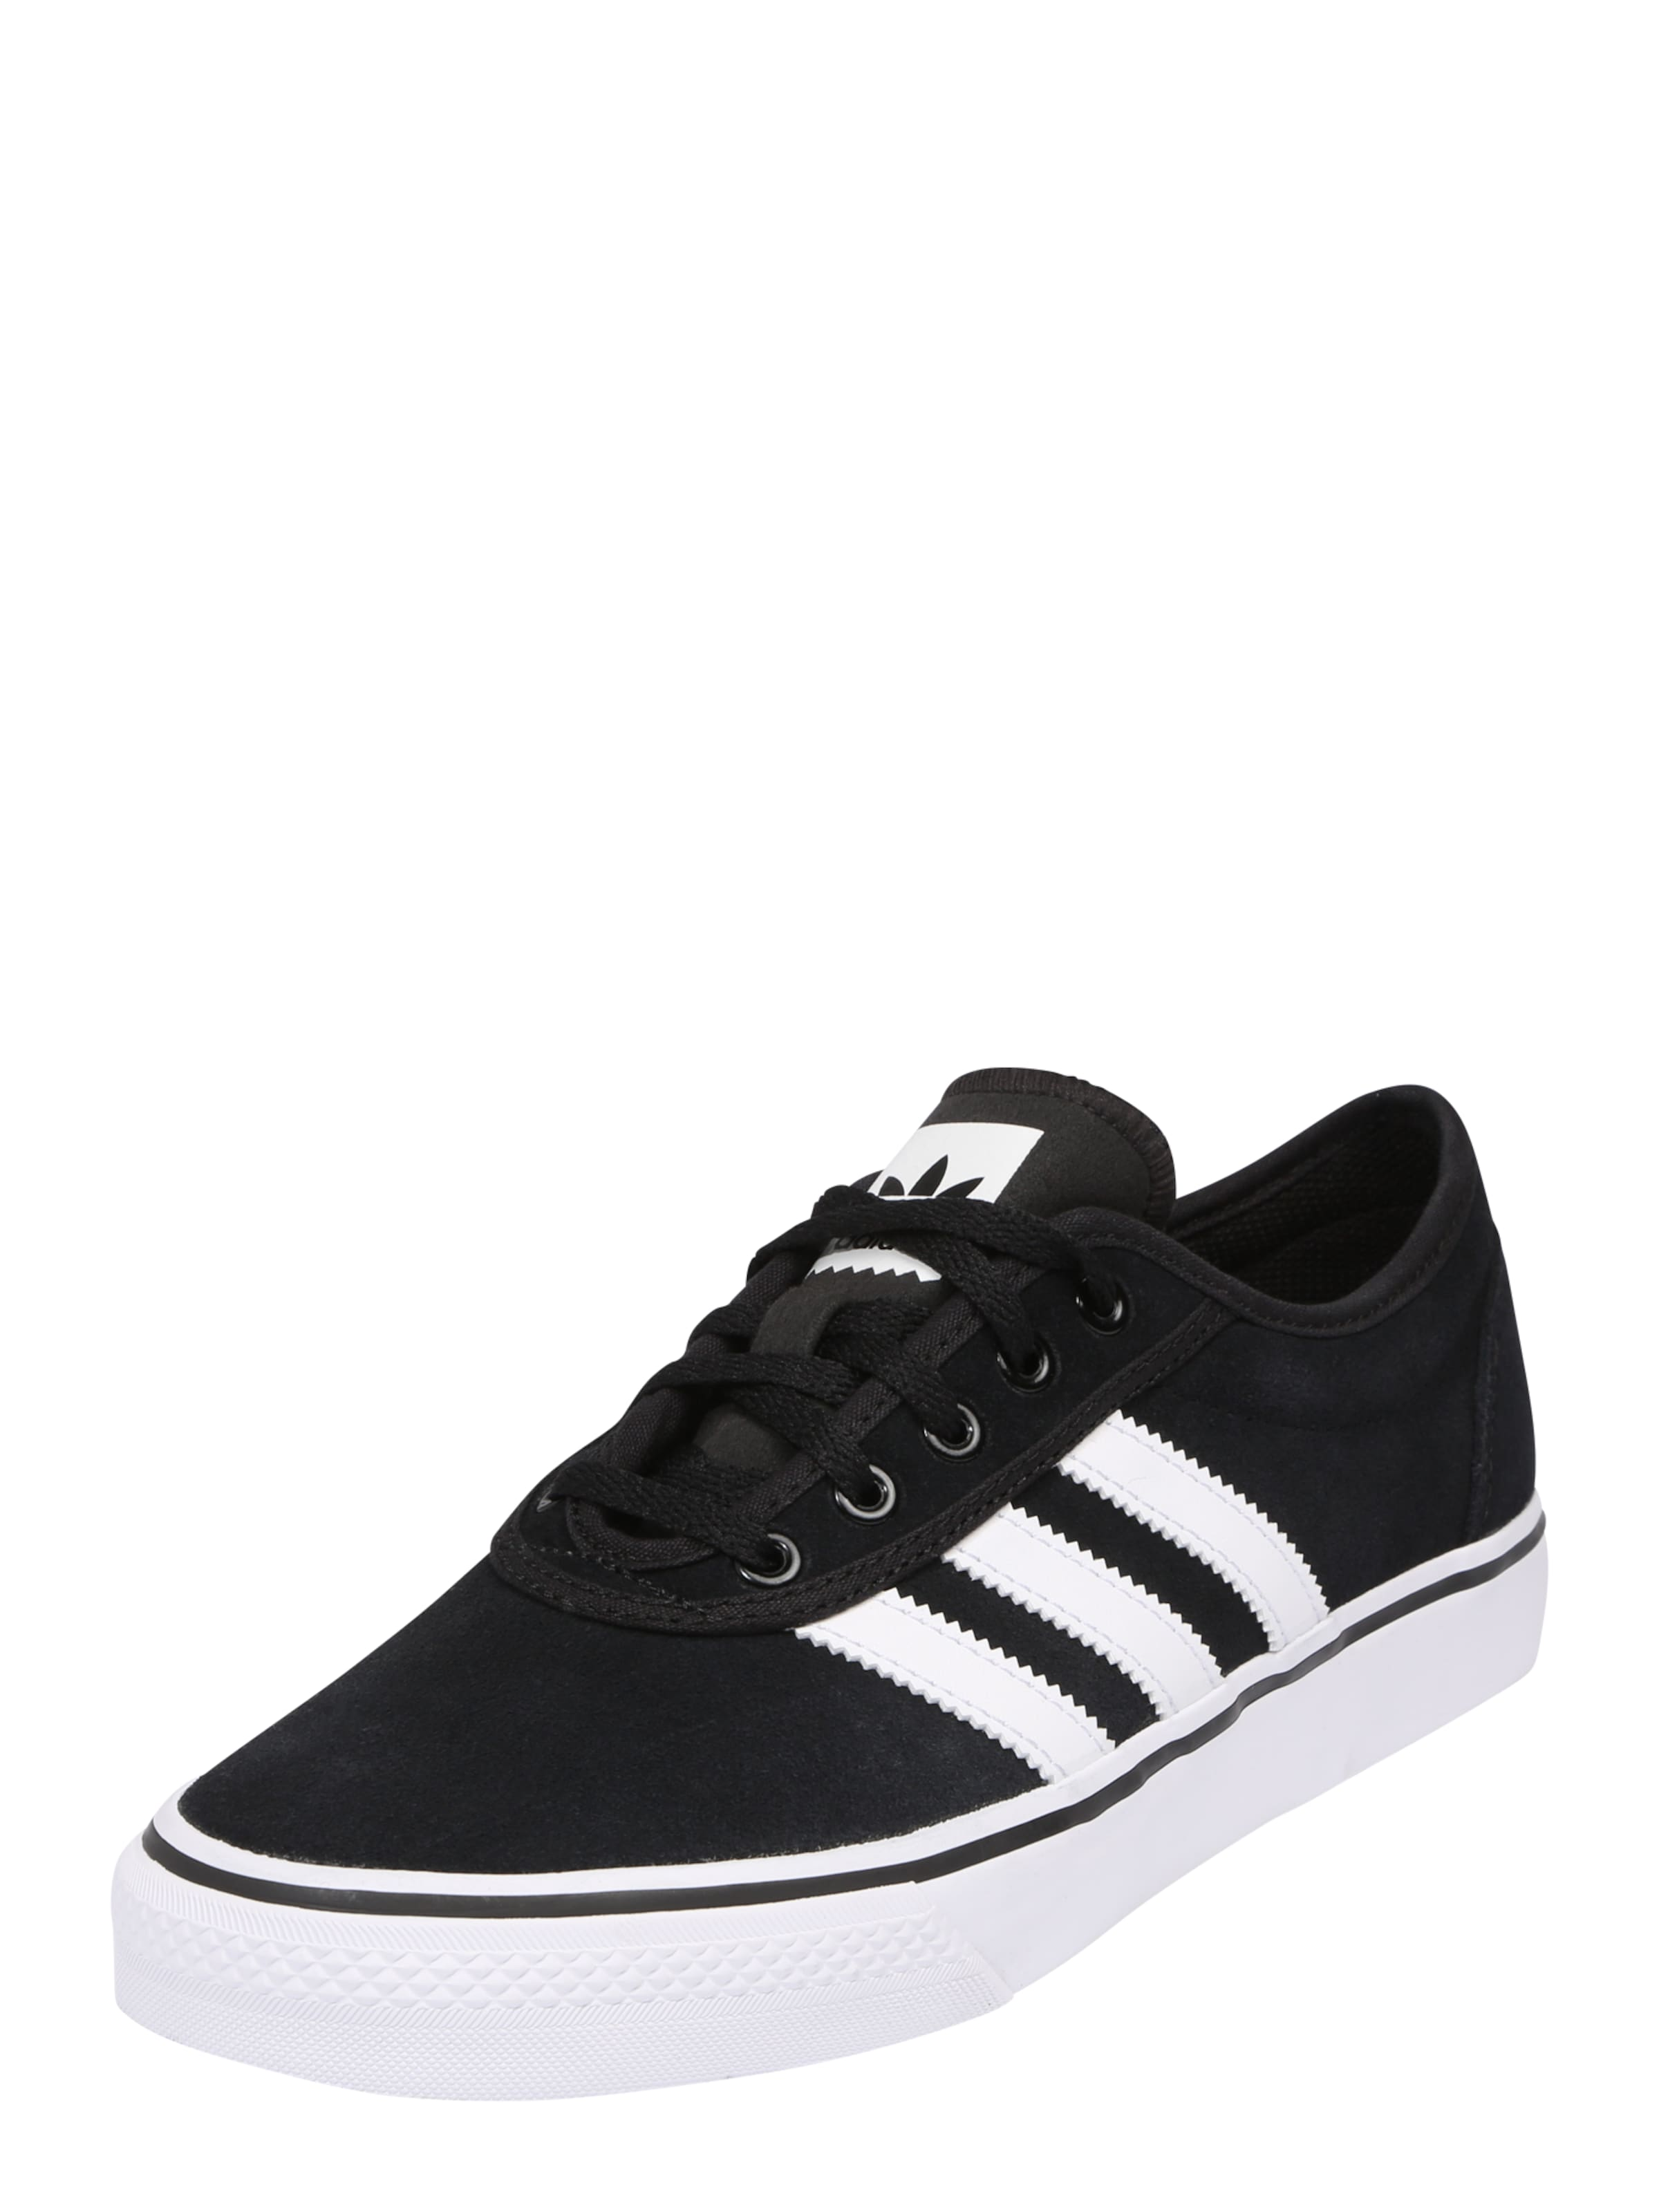 ADIDAS ORIGINALS Sneaker ADI-EASE Verschleißfeste billige Schuhe